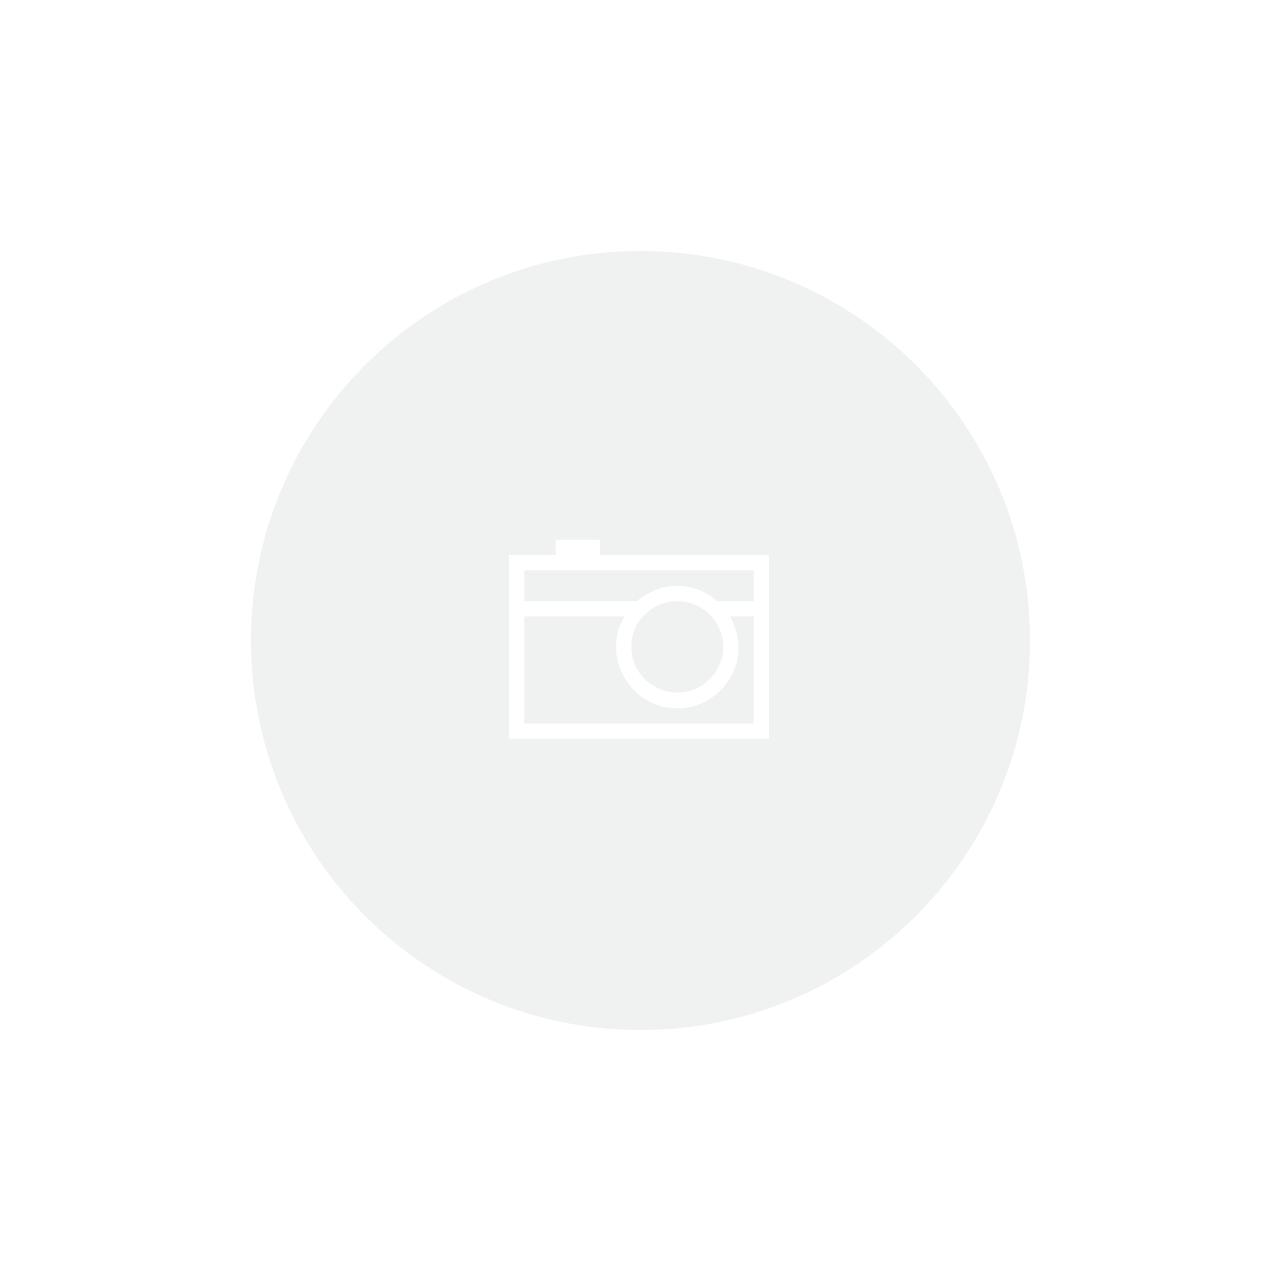 Placa de Vídeo GIGABYTE GEFORCE GTX 1080 Ti 11GB TURBO GDDR5X GV-N108TTURBO-11GD